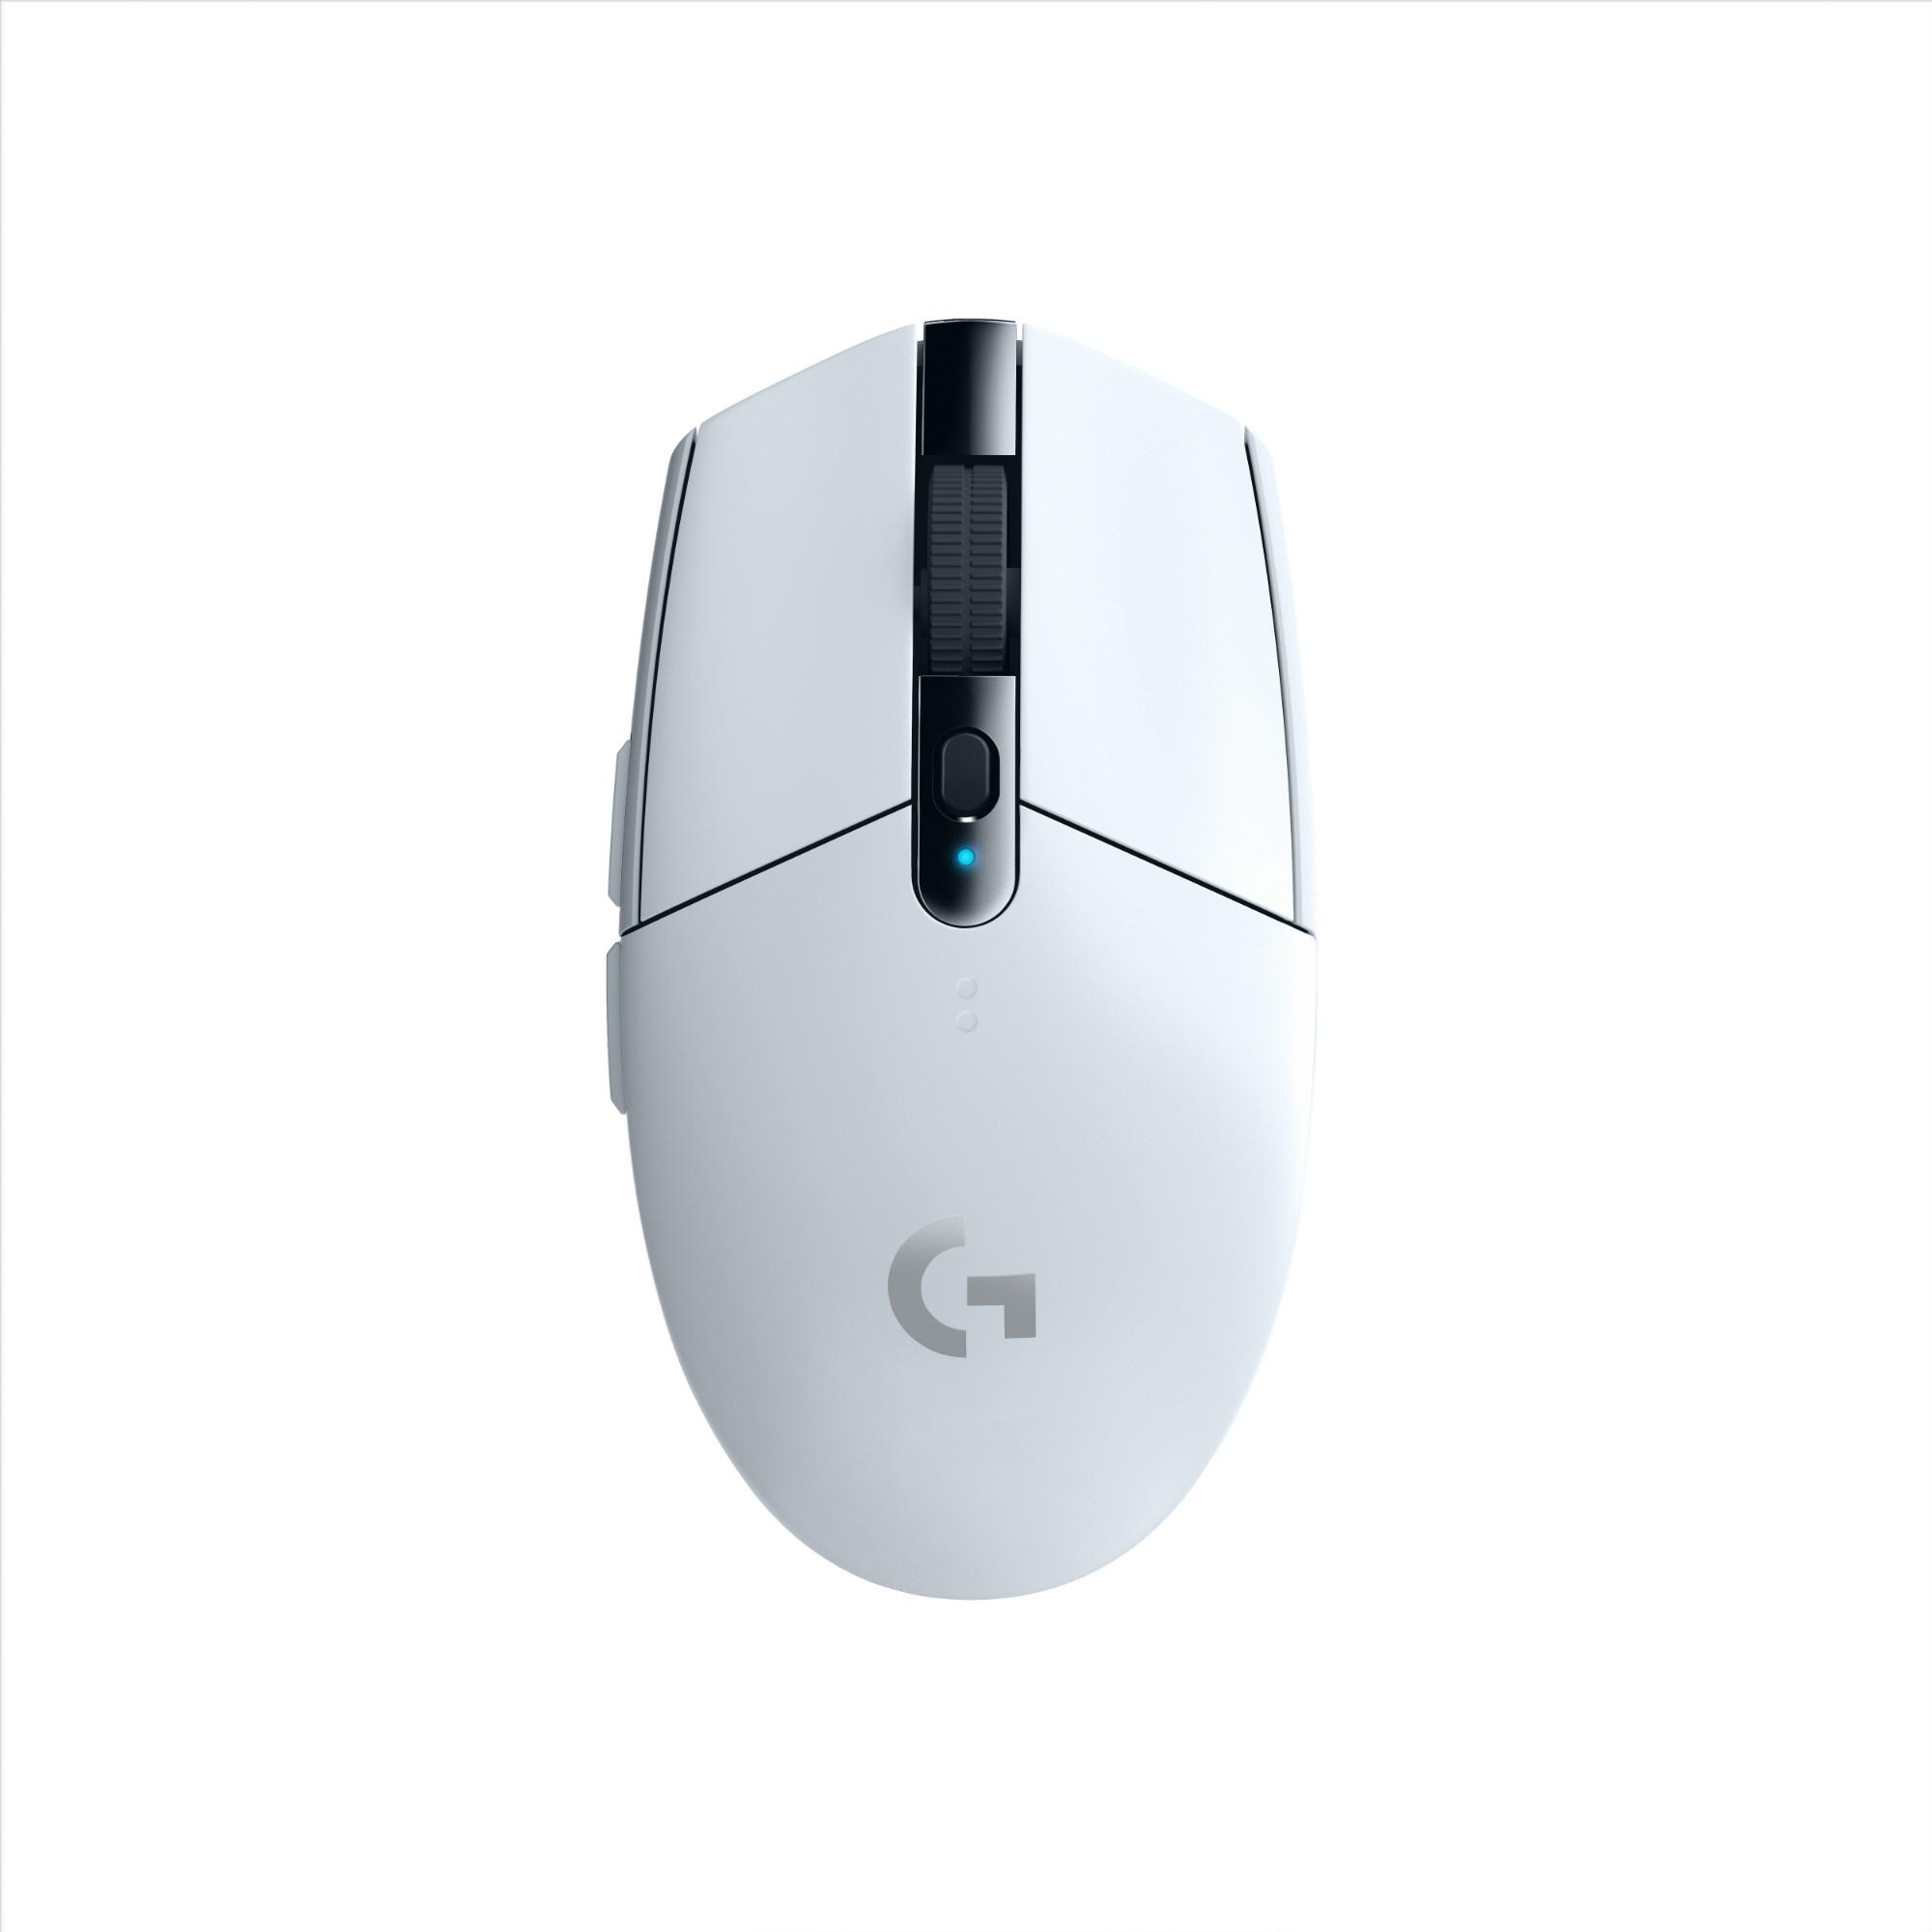 Logitech G305 ratón RF inalámbrico Óptico 12000 DPI mano derecha